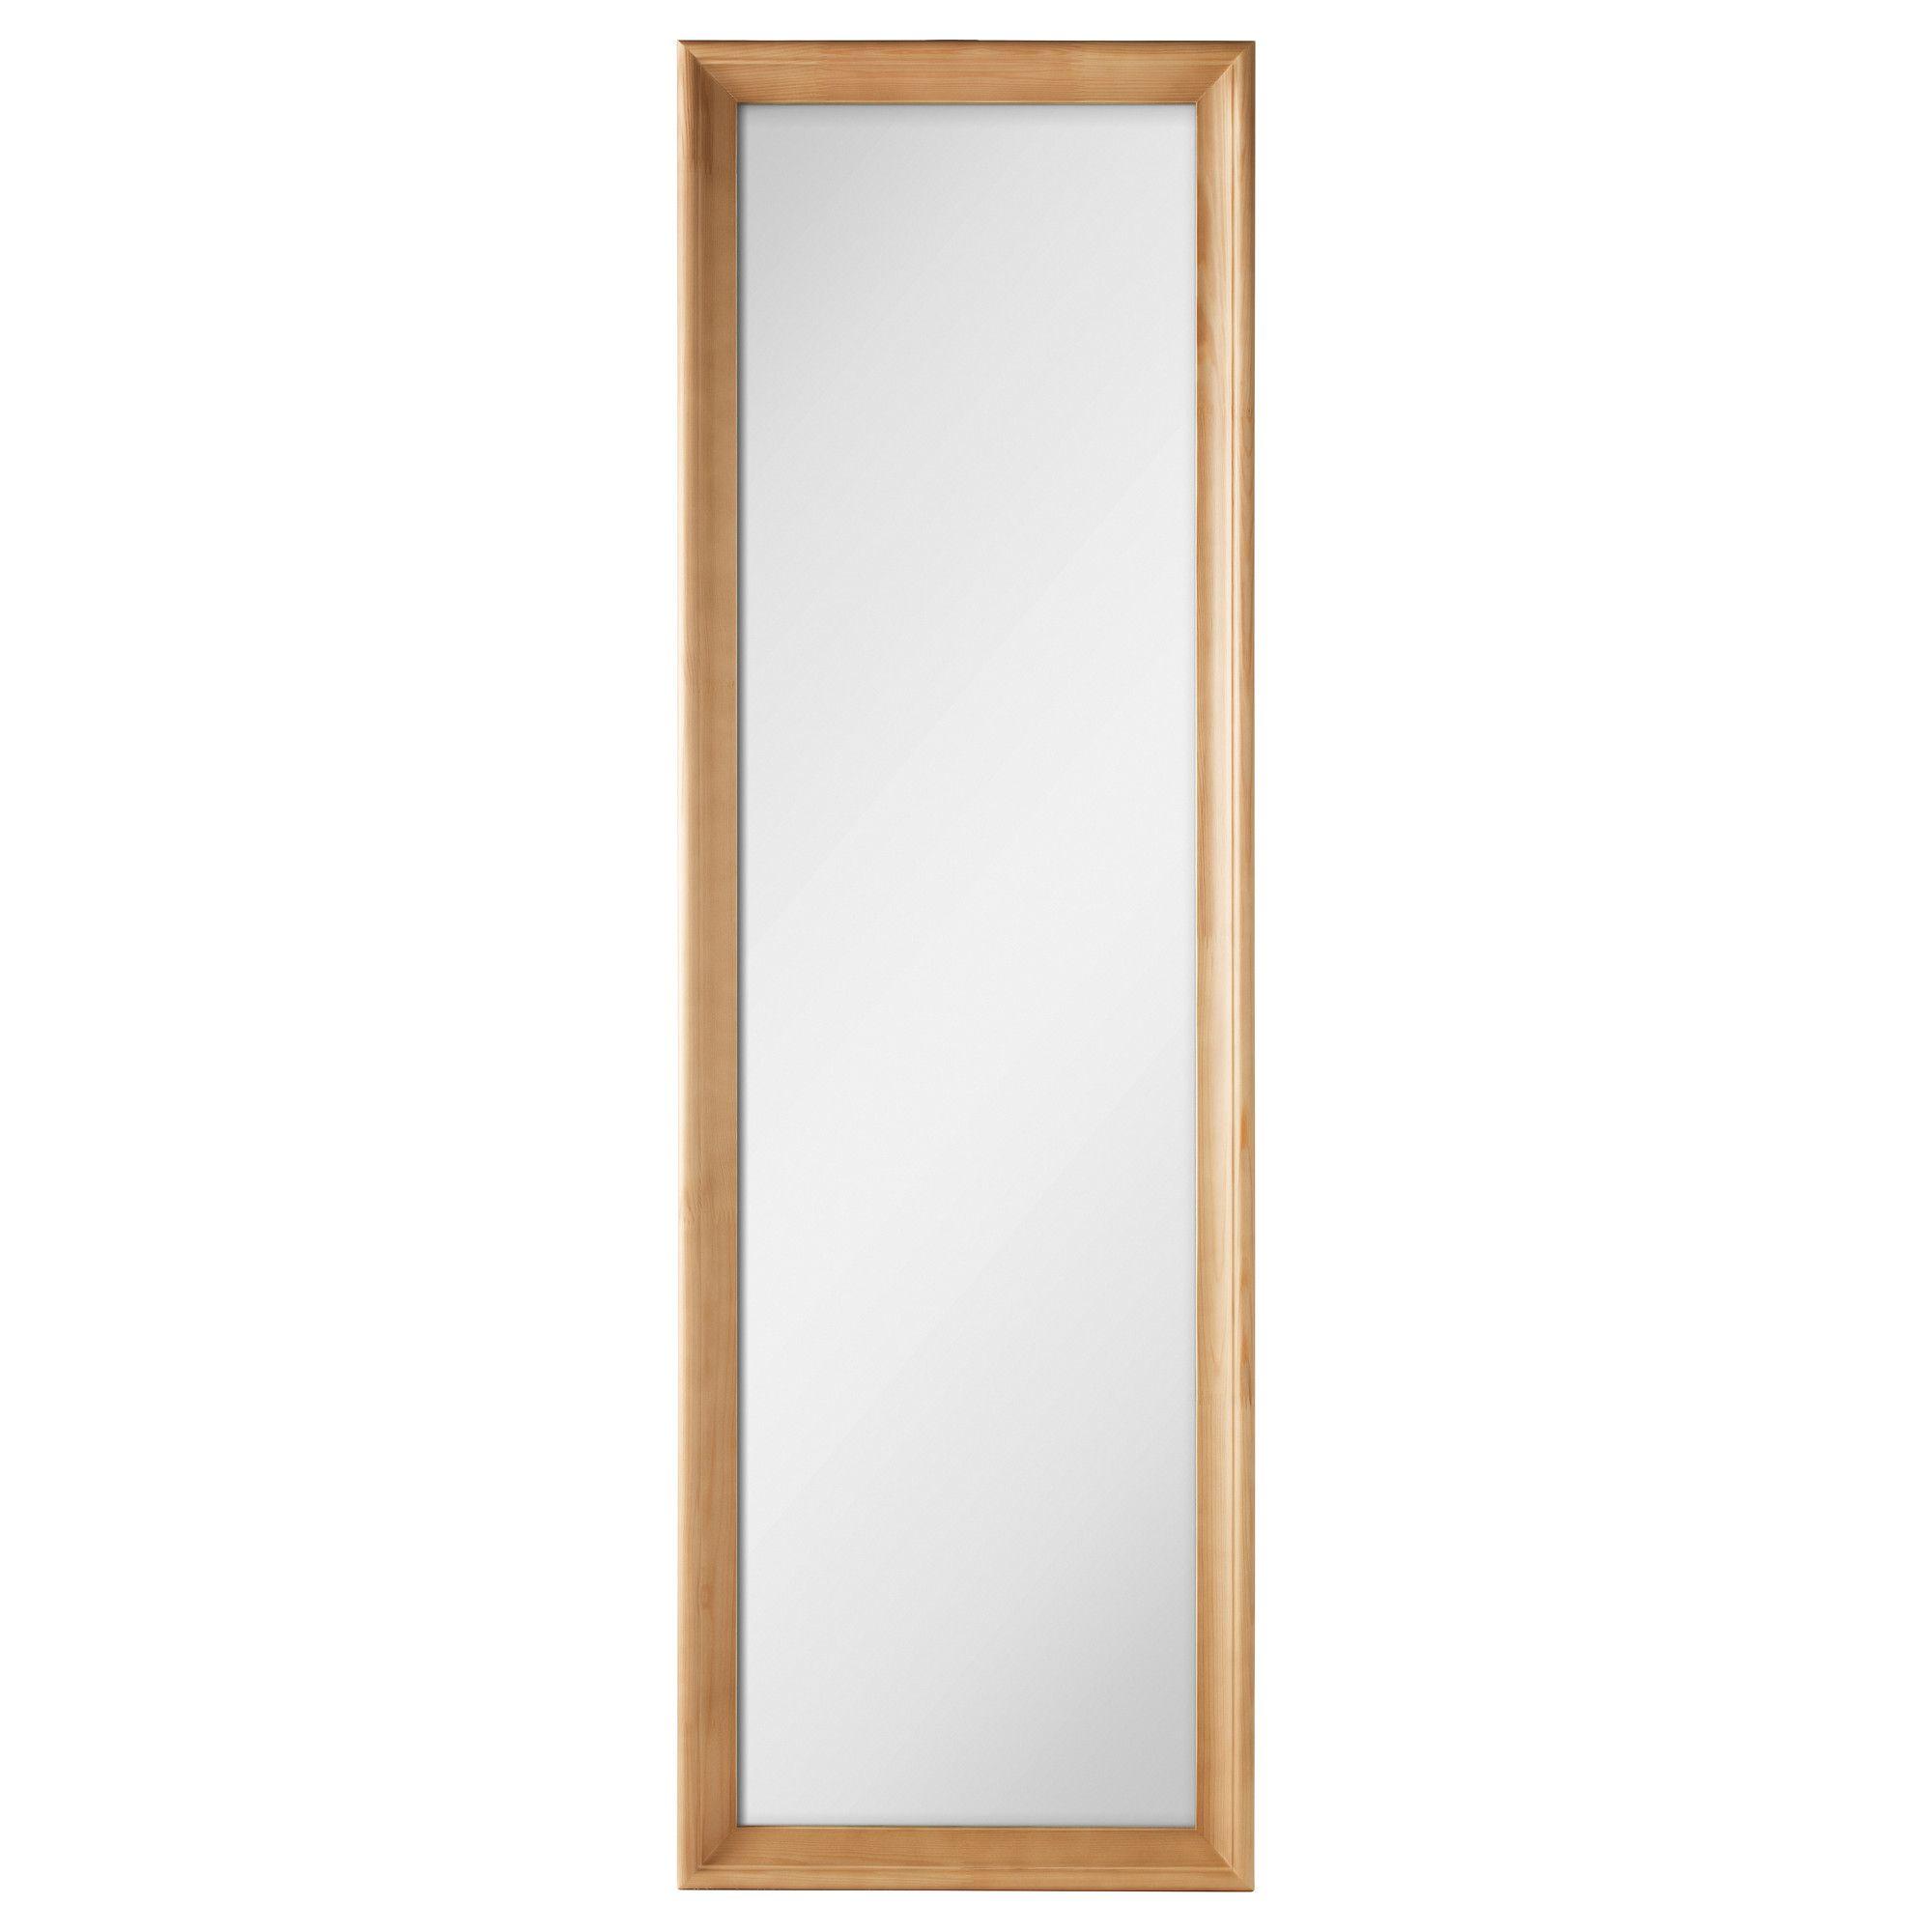 Mobel Einrichtungsideen Fur Dein Zuhause Spiegel Ikea Ikea